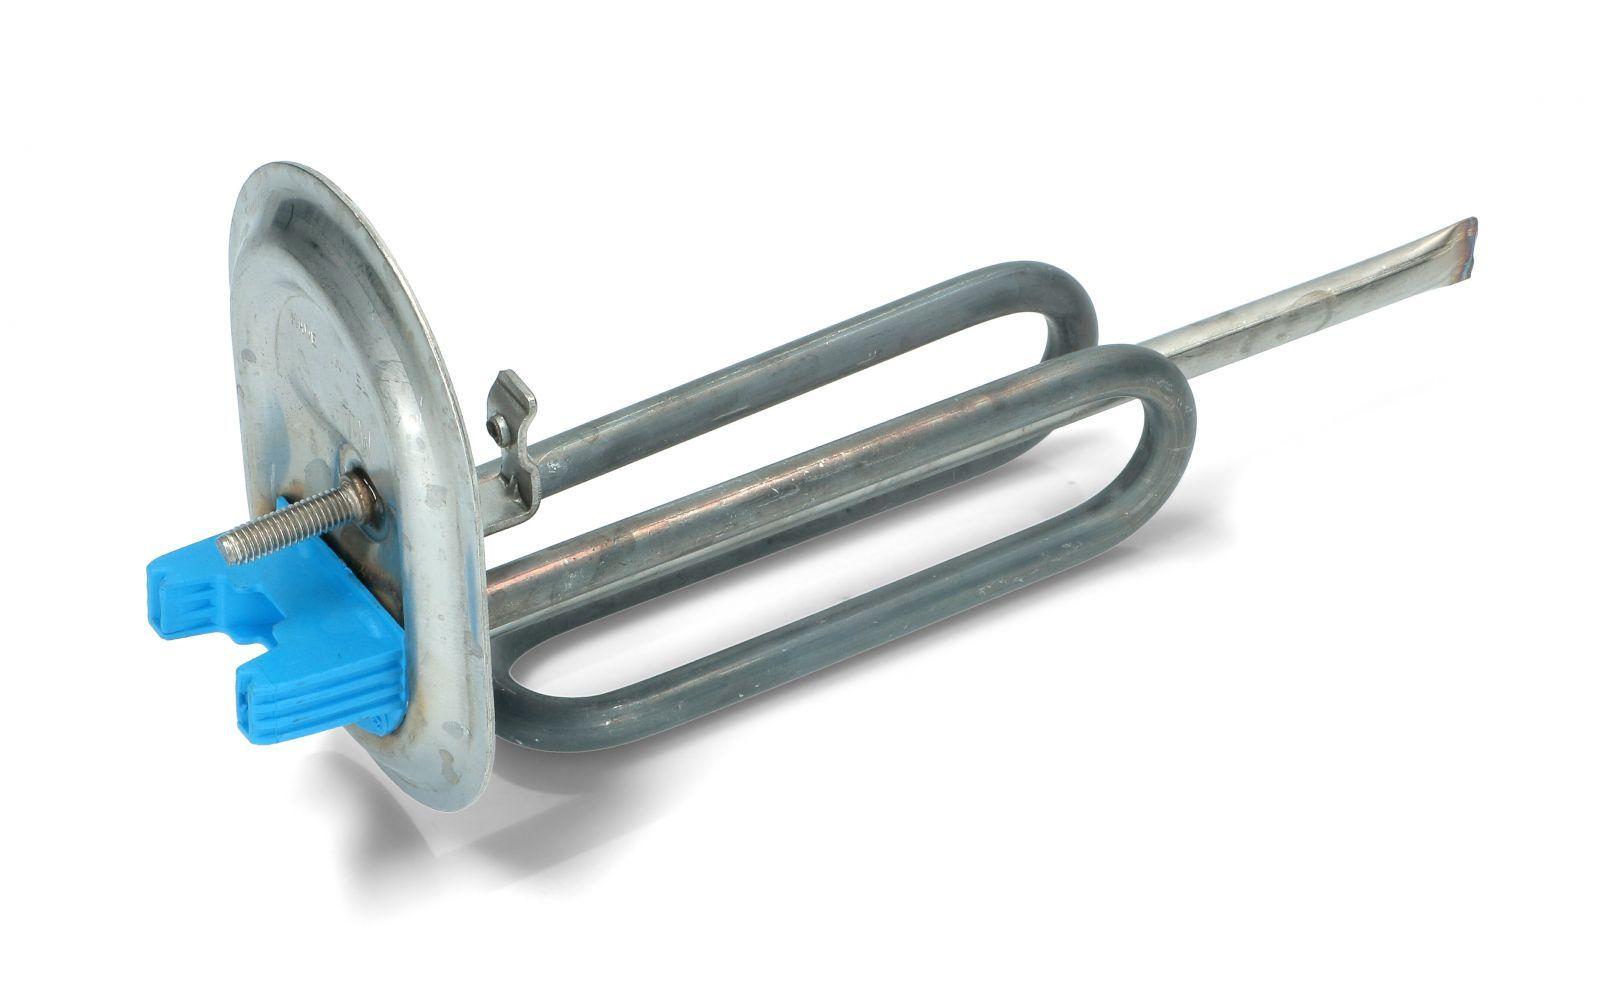 Heater for Gorenje Water Heater - 017548 Gorenje / Mora